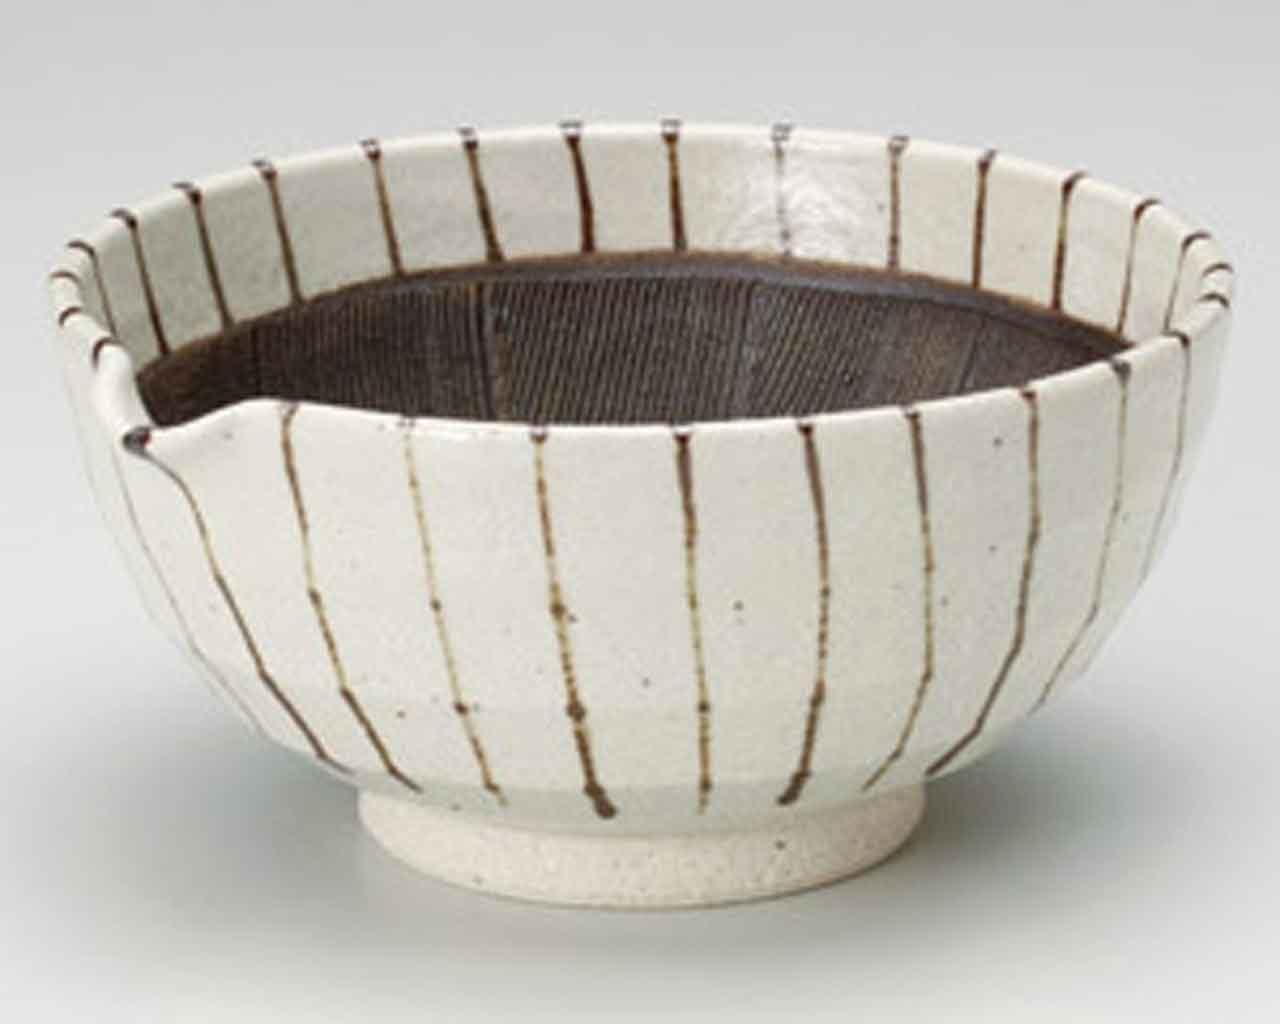 Sabi Tokusa 16cm Mortar Beige Ceramic Made in Japan